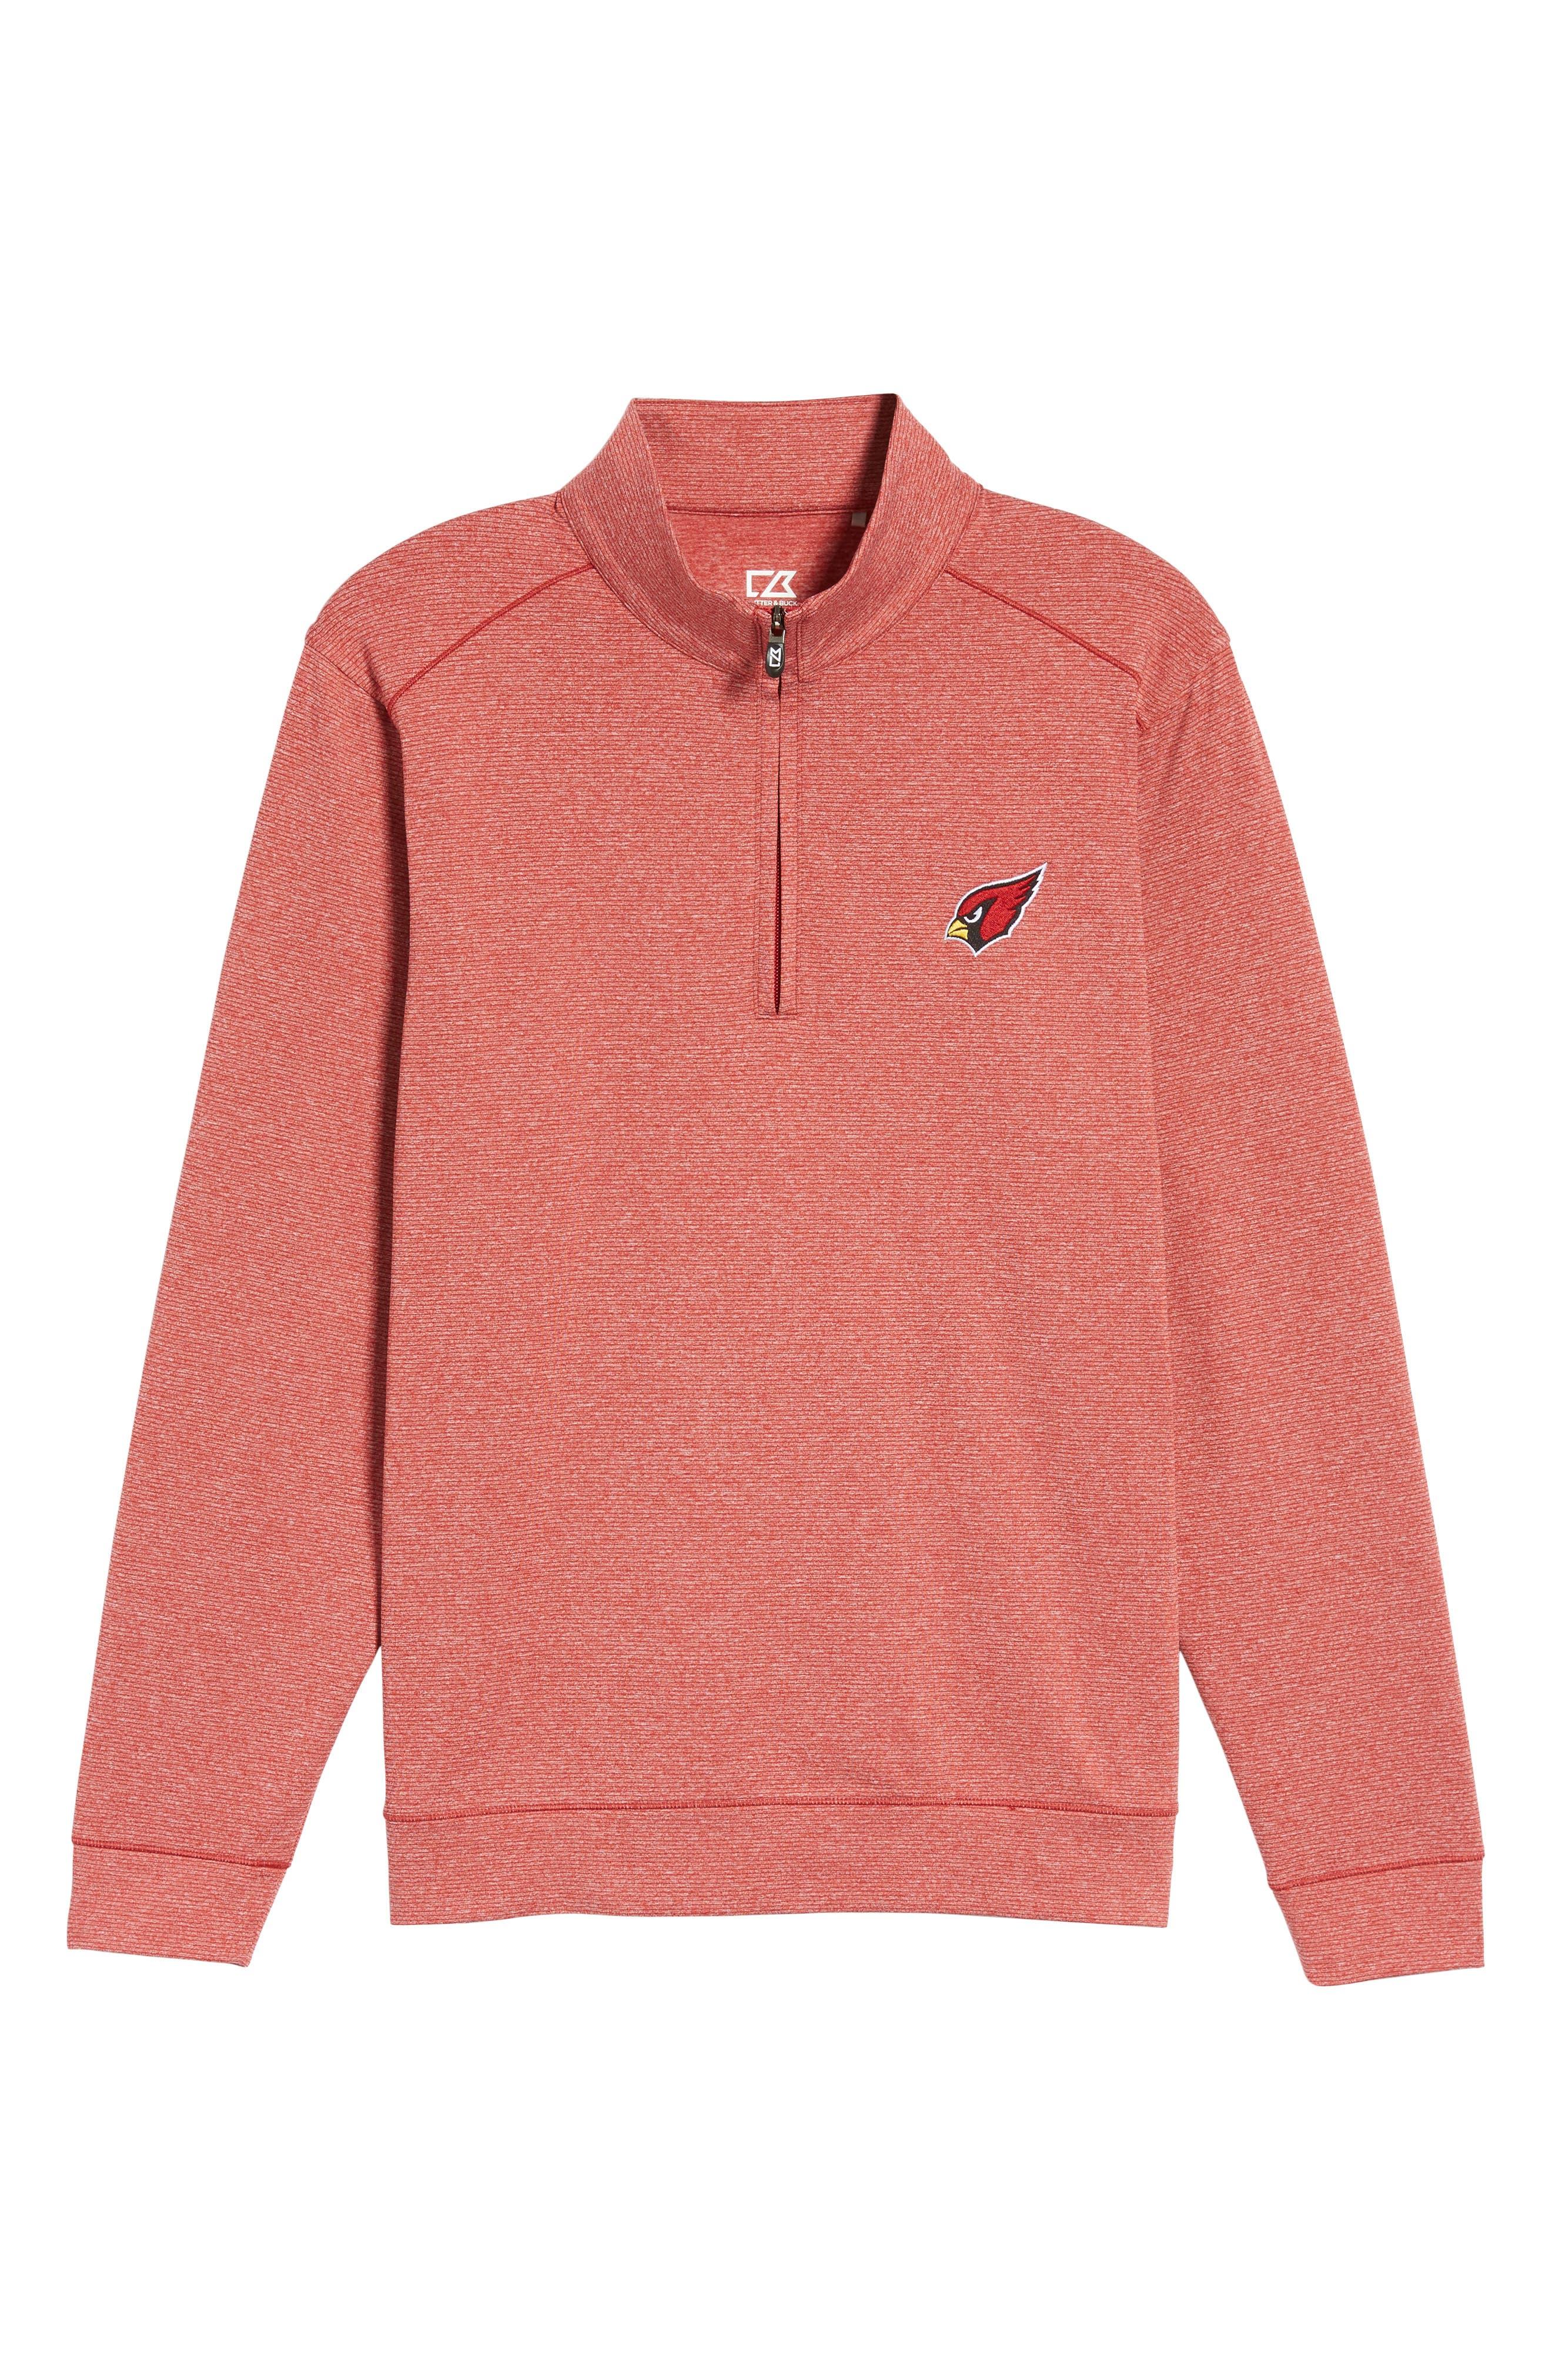 Shoreline - Arizona Cardinals Half Zip Pullover,                             Alternate thumbnail 6, color,                             Cardinal Red Heather